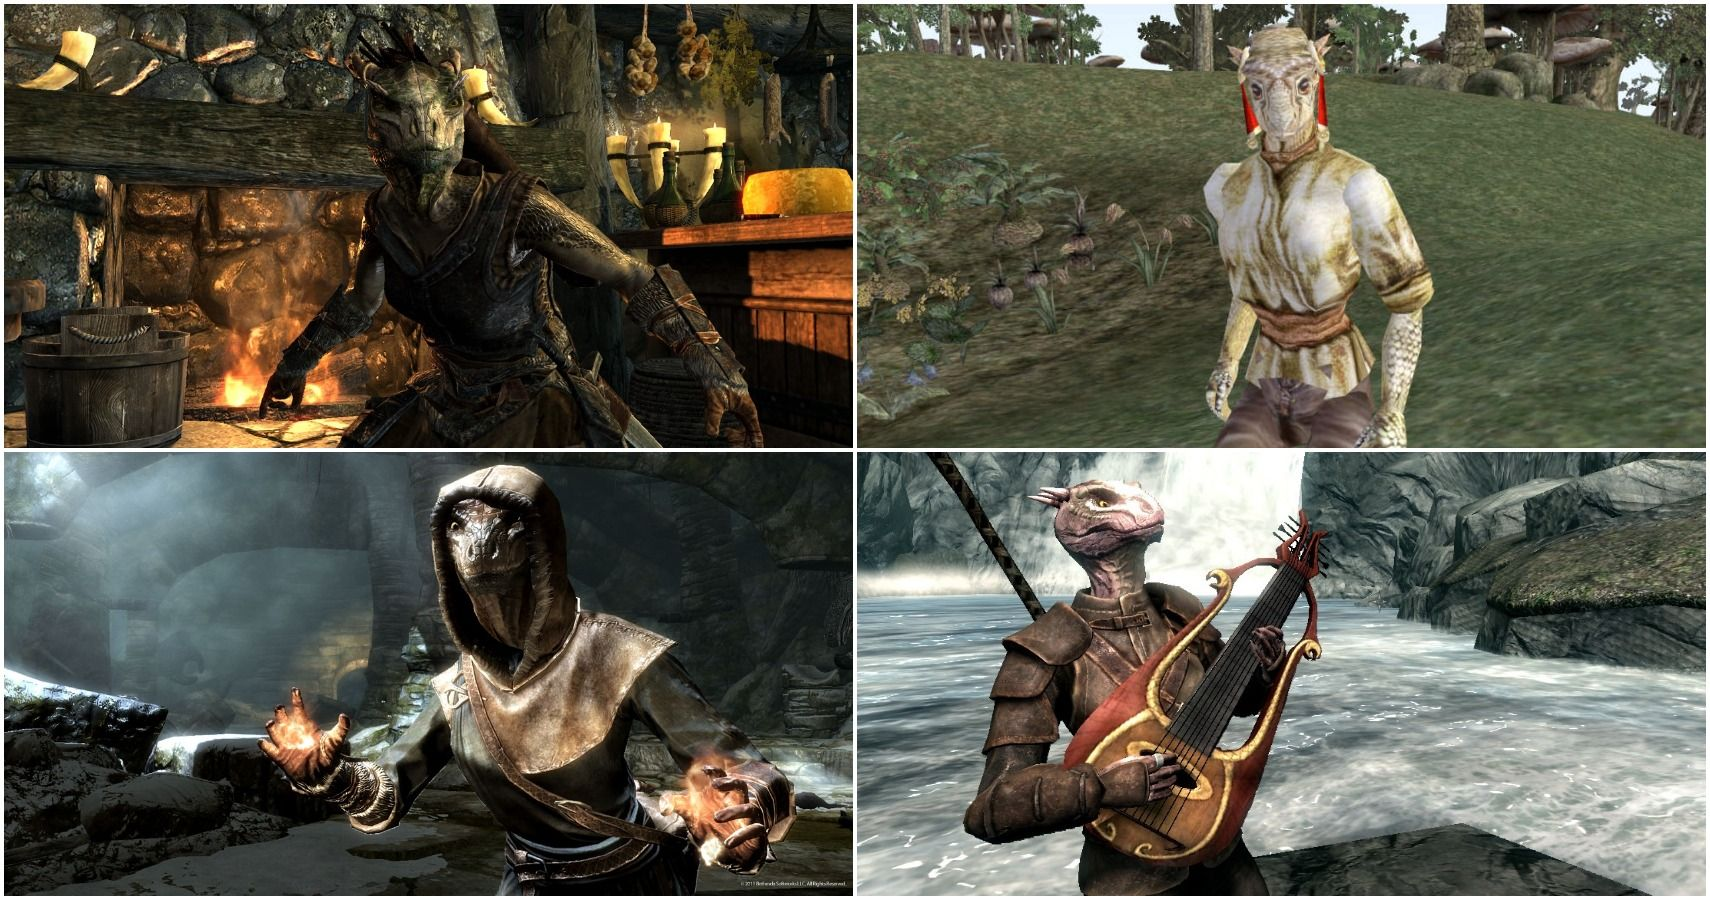 1000+ images about Skyrim Memes on Pinterest   Skyrim ...  Elder Scrolls Memes